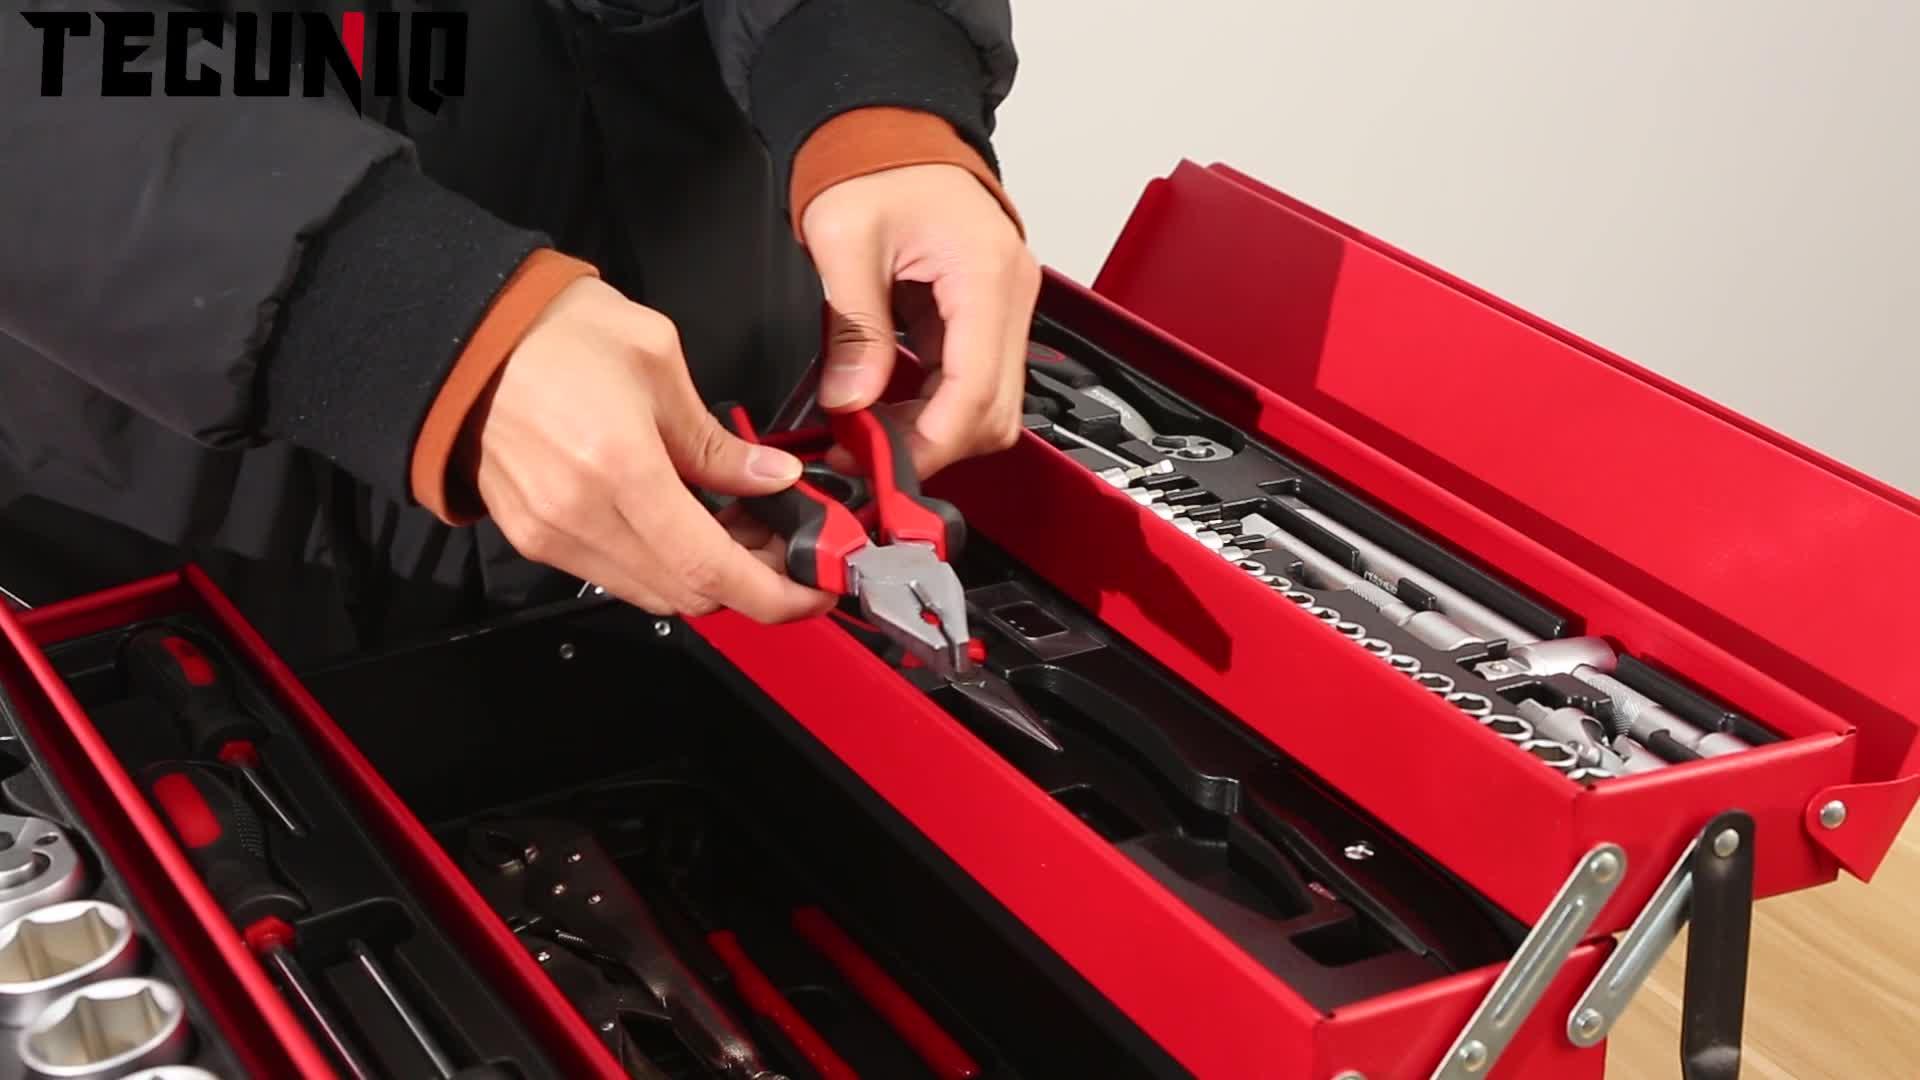 TECUNIQ 86pcs רכב תיקון ברגים סט כלי ערכות רב תכליתי מכונאי רכב רכב יד כלים סט עבור חג המולד מתנה